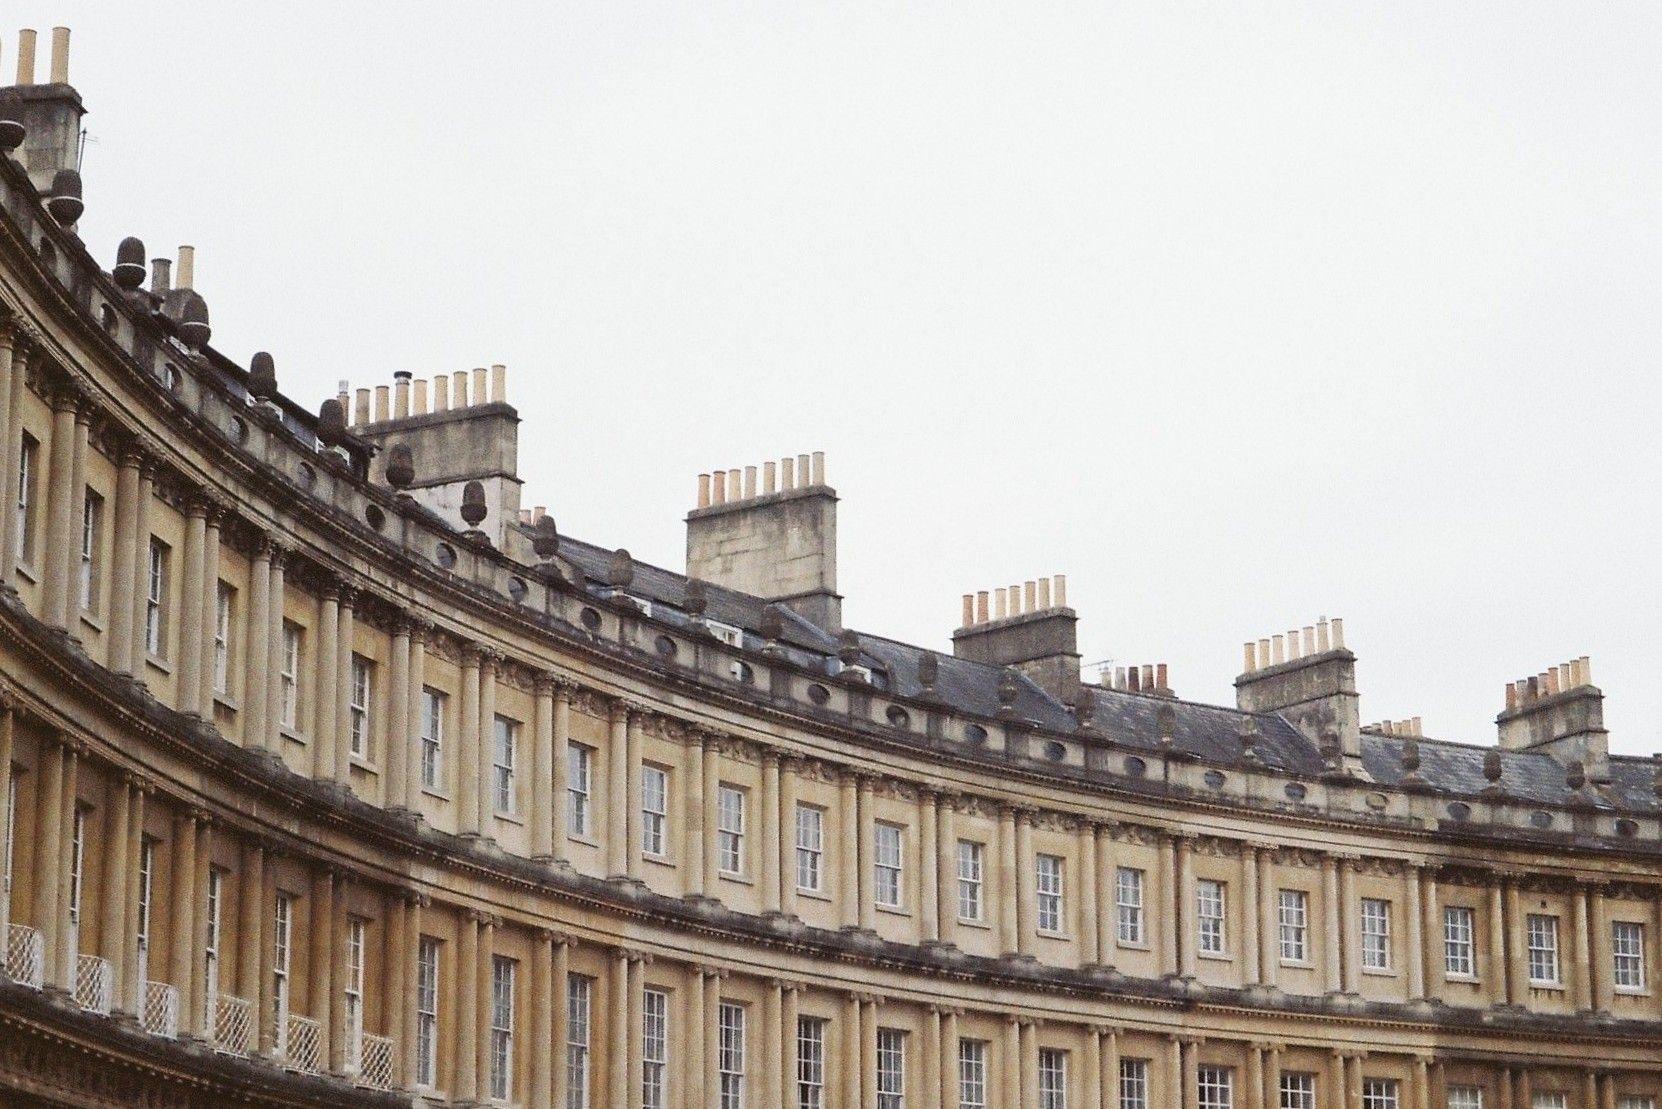 bath, royal crescent bath. bath architecture, bath photography